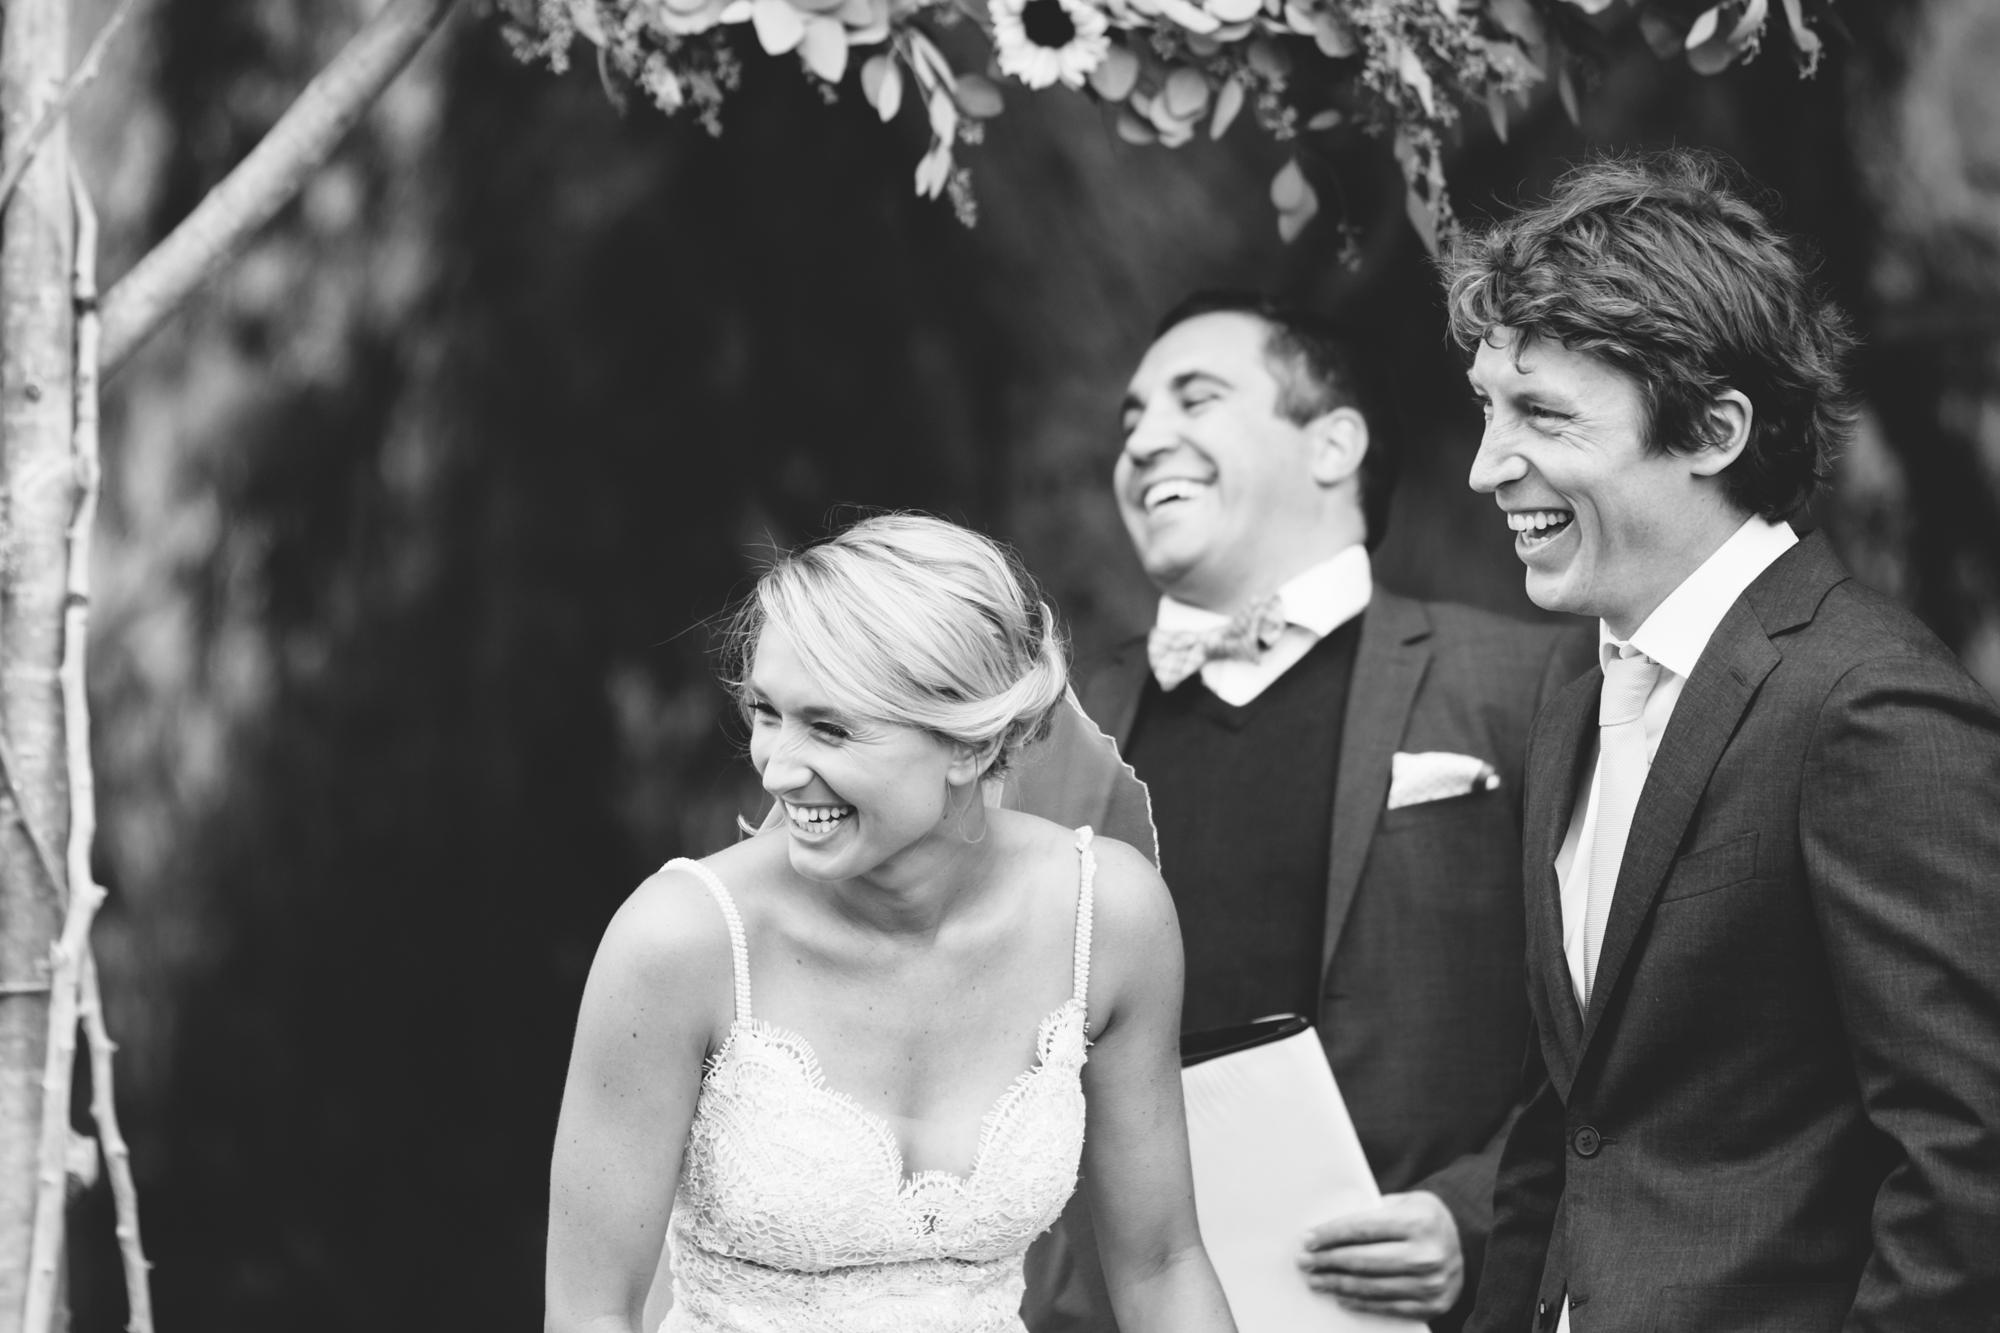 20160924_2016.09.24_CropperEifert_Wedding_website_UD9A0509 copy.jpg